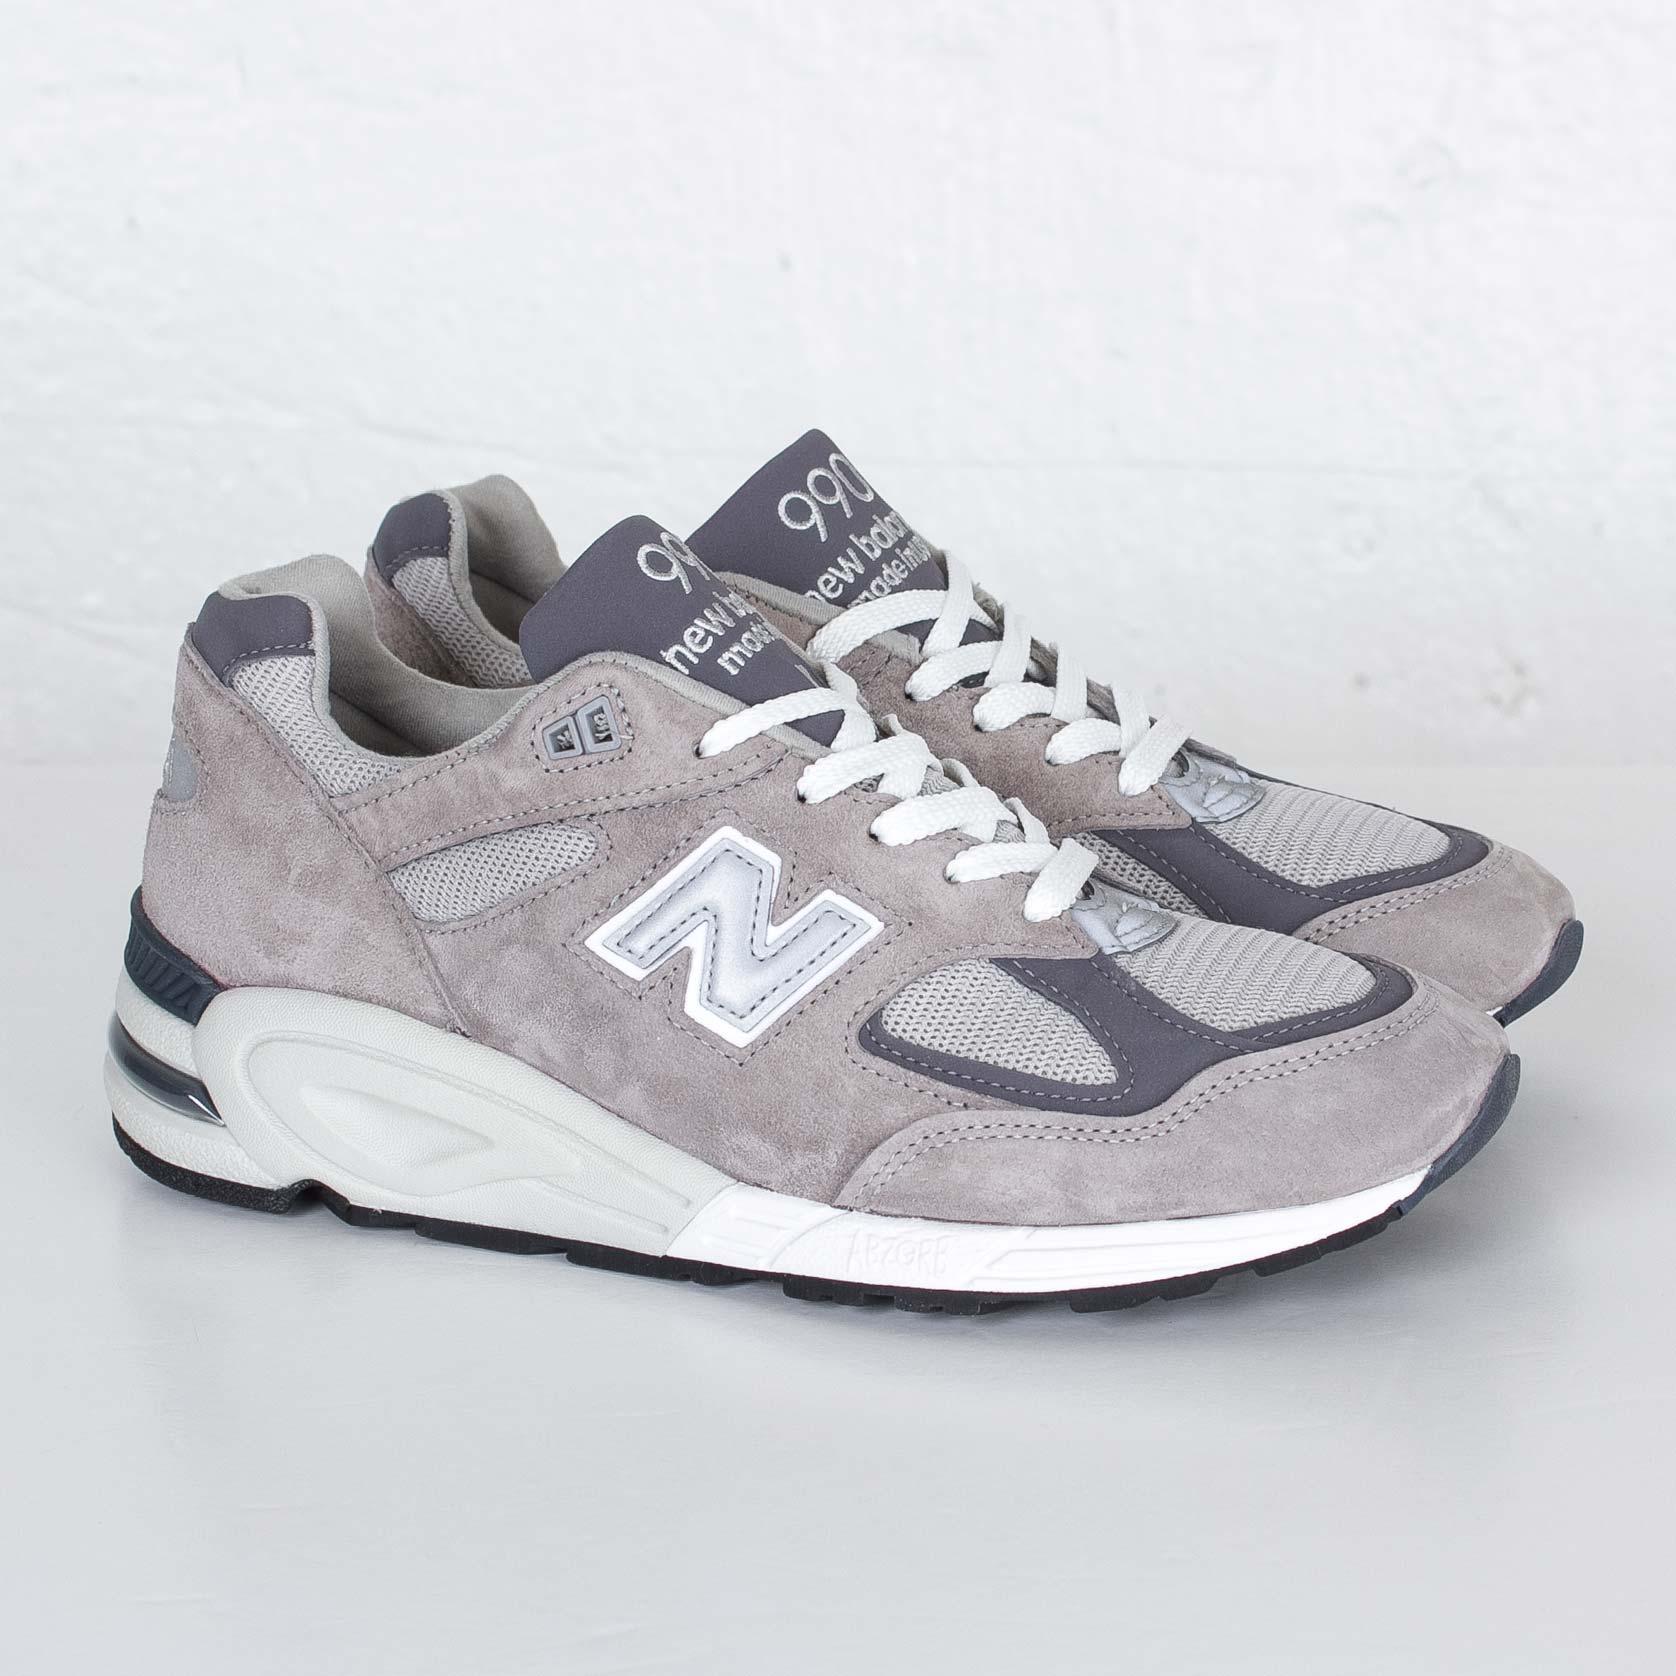 acheter pas cher a3353 340de New Balance M990 - M990gr2 - Sneakersnstuff   sneakers ...